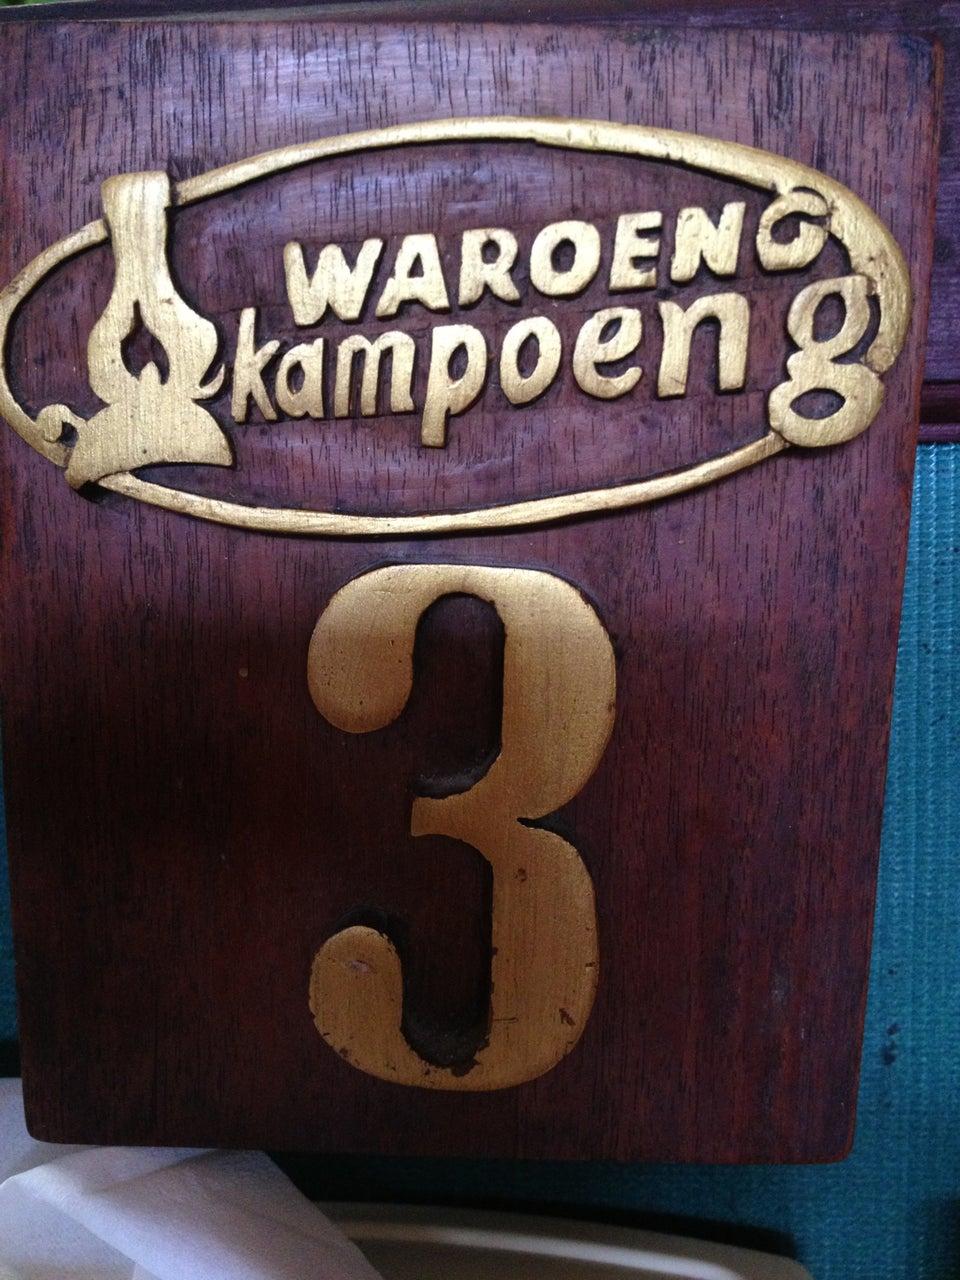 Warung Kampoeng